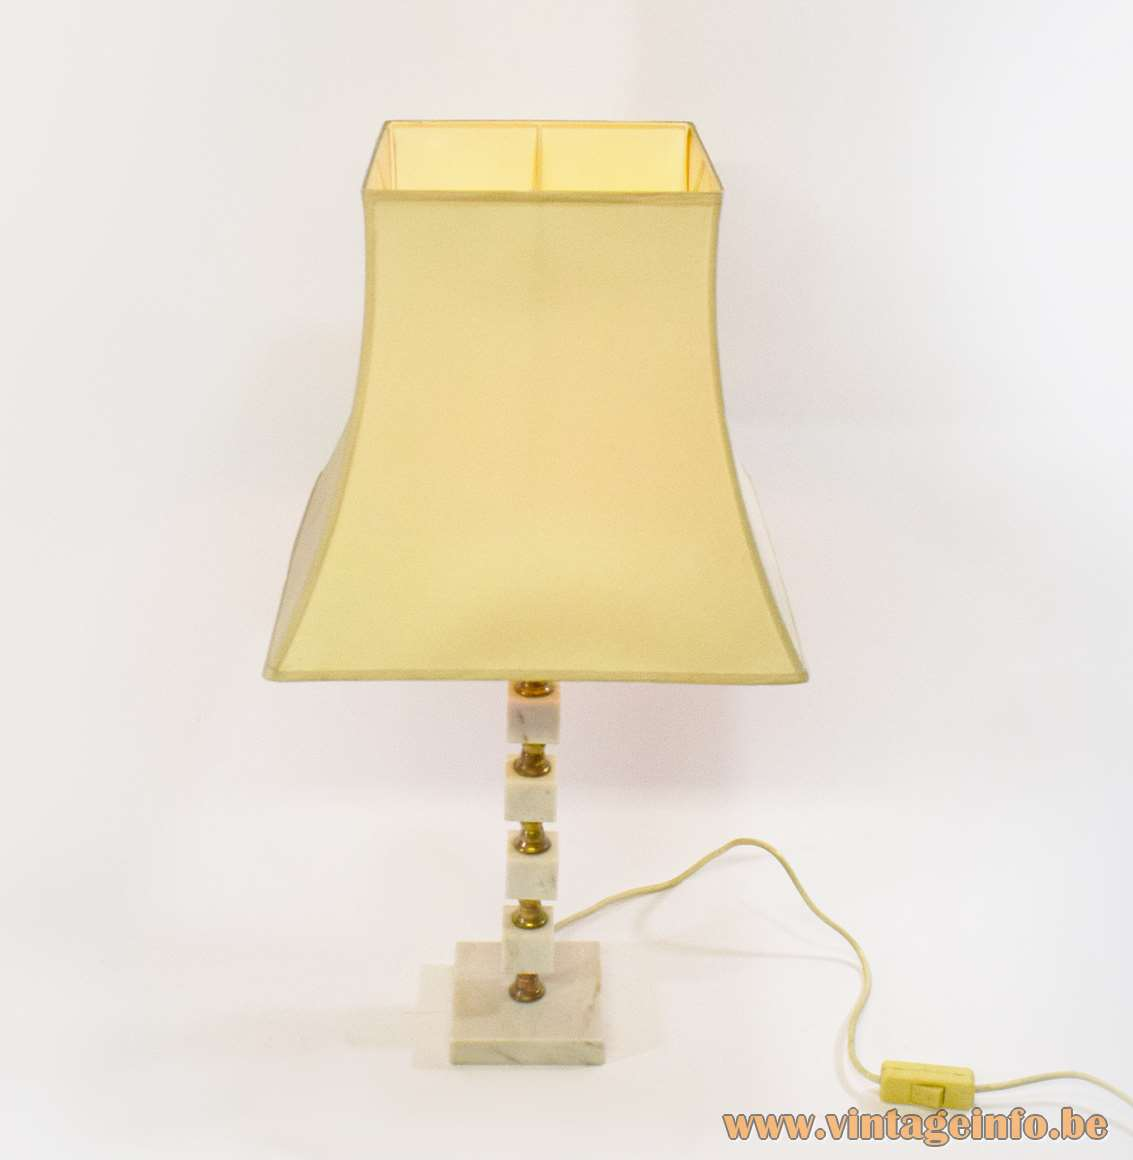 Bulgarian Table Lamp